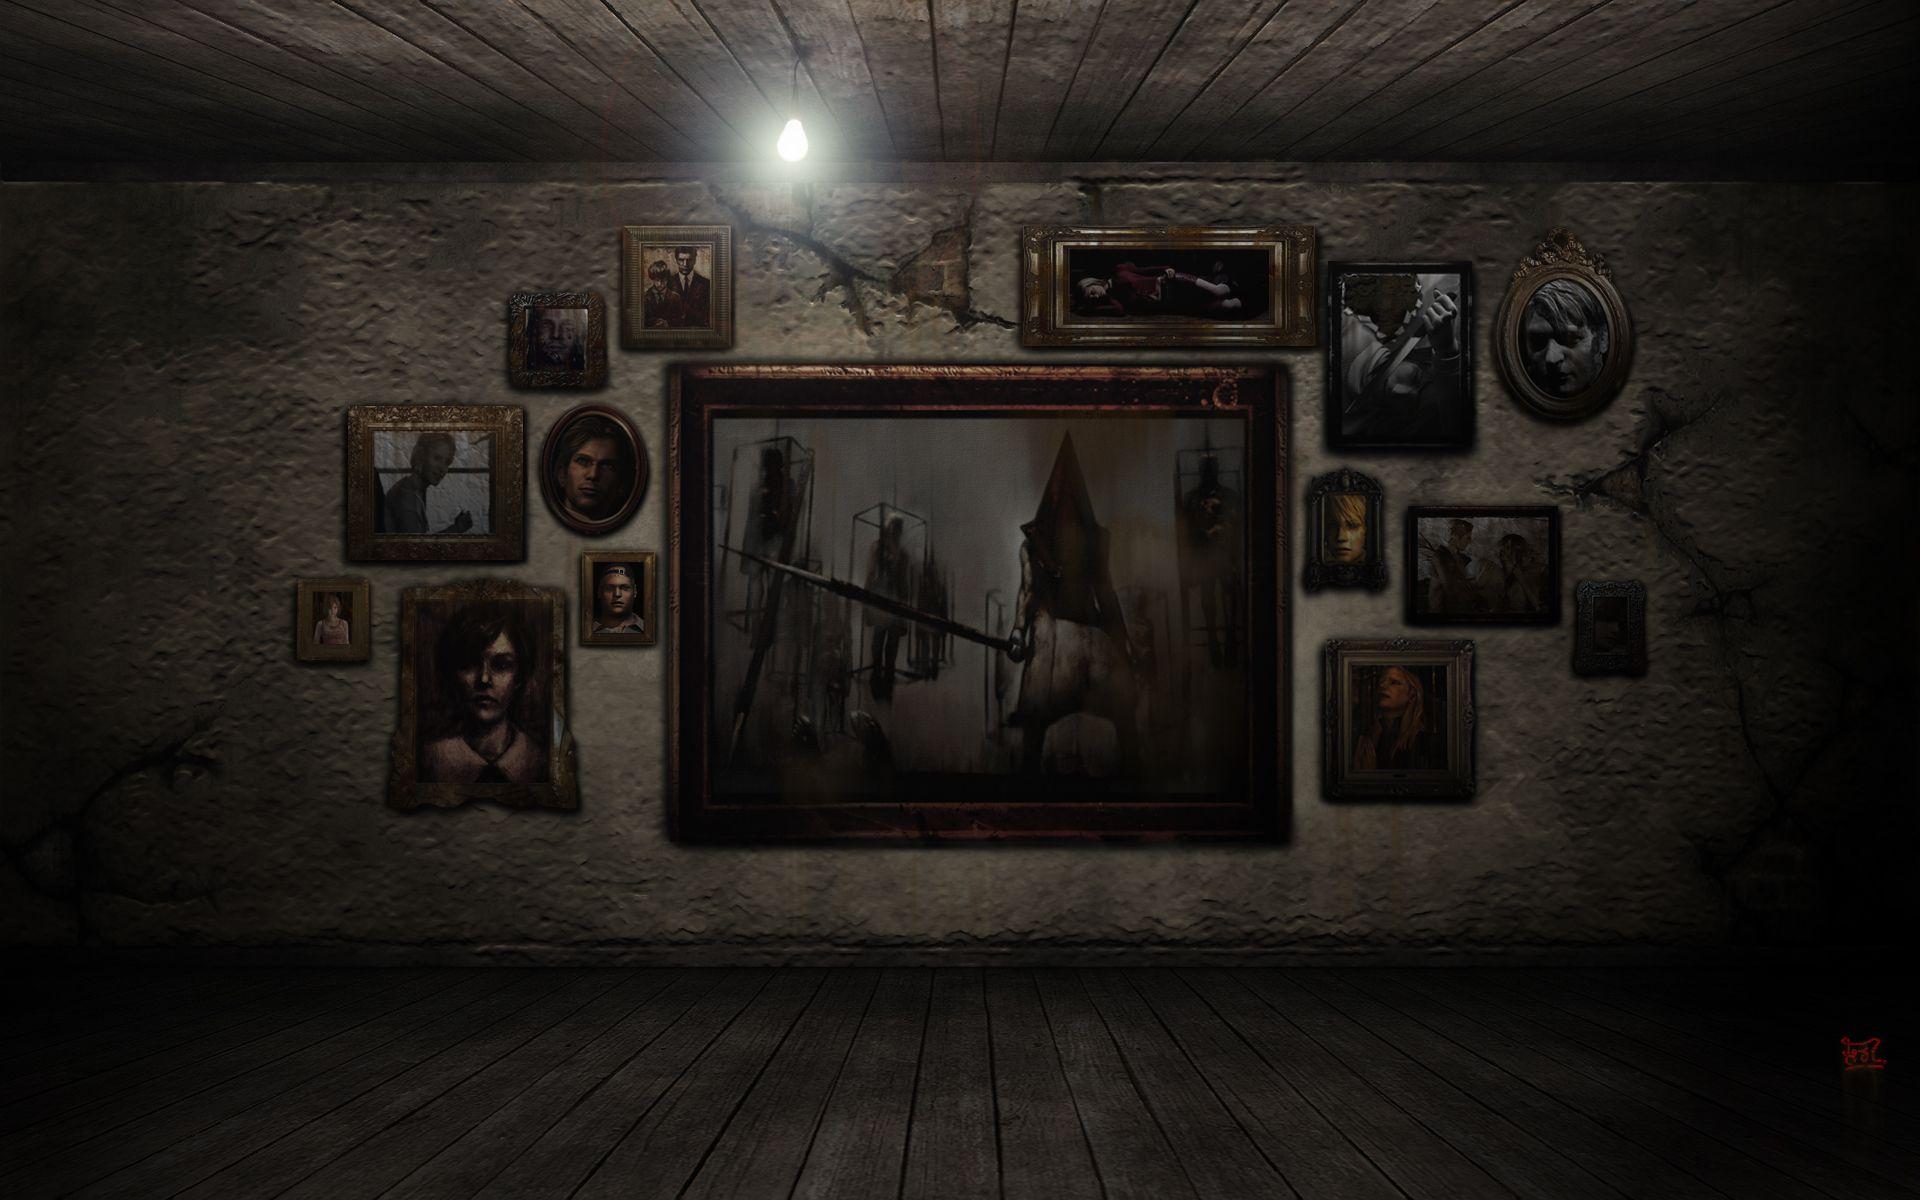 Silent Hill The Pic Room By Cerberus071984 On Deviantart Silent Hill Silent Free Desktop Wallpaper